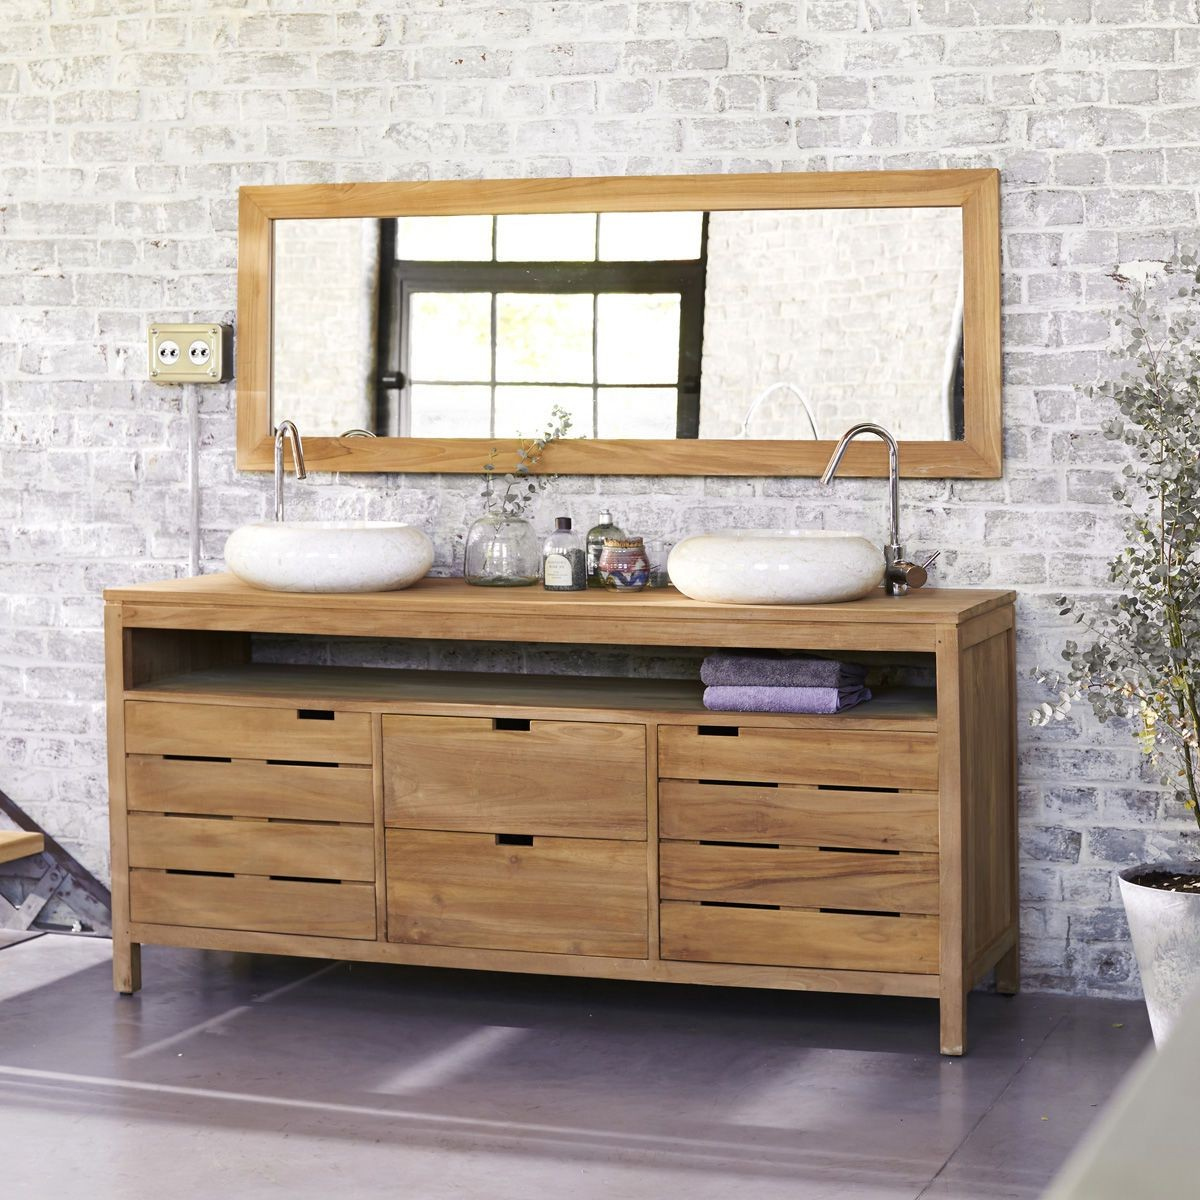 Meuble salle de bains ikea armoire id es de d coration for Ikea meubles salle de bain